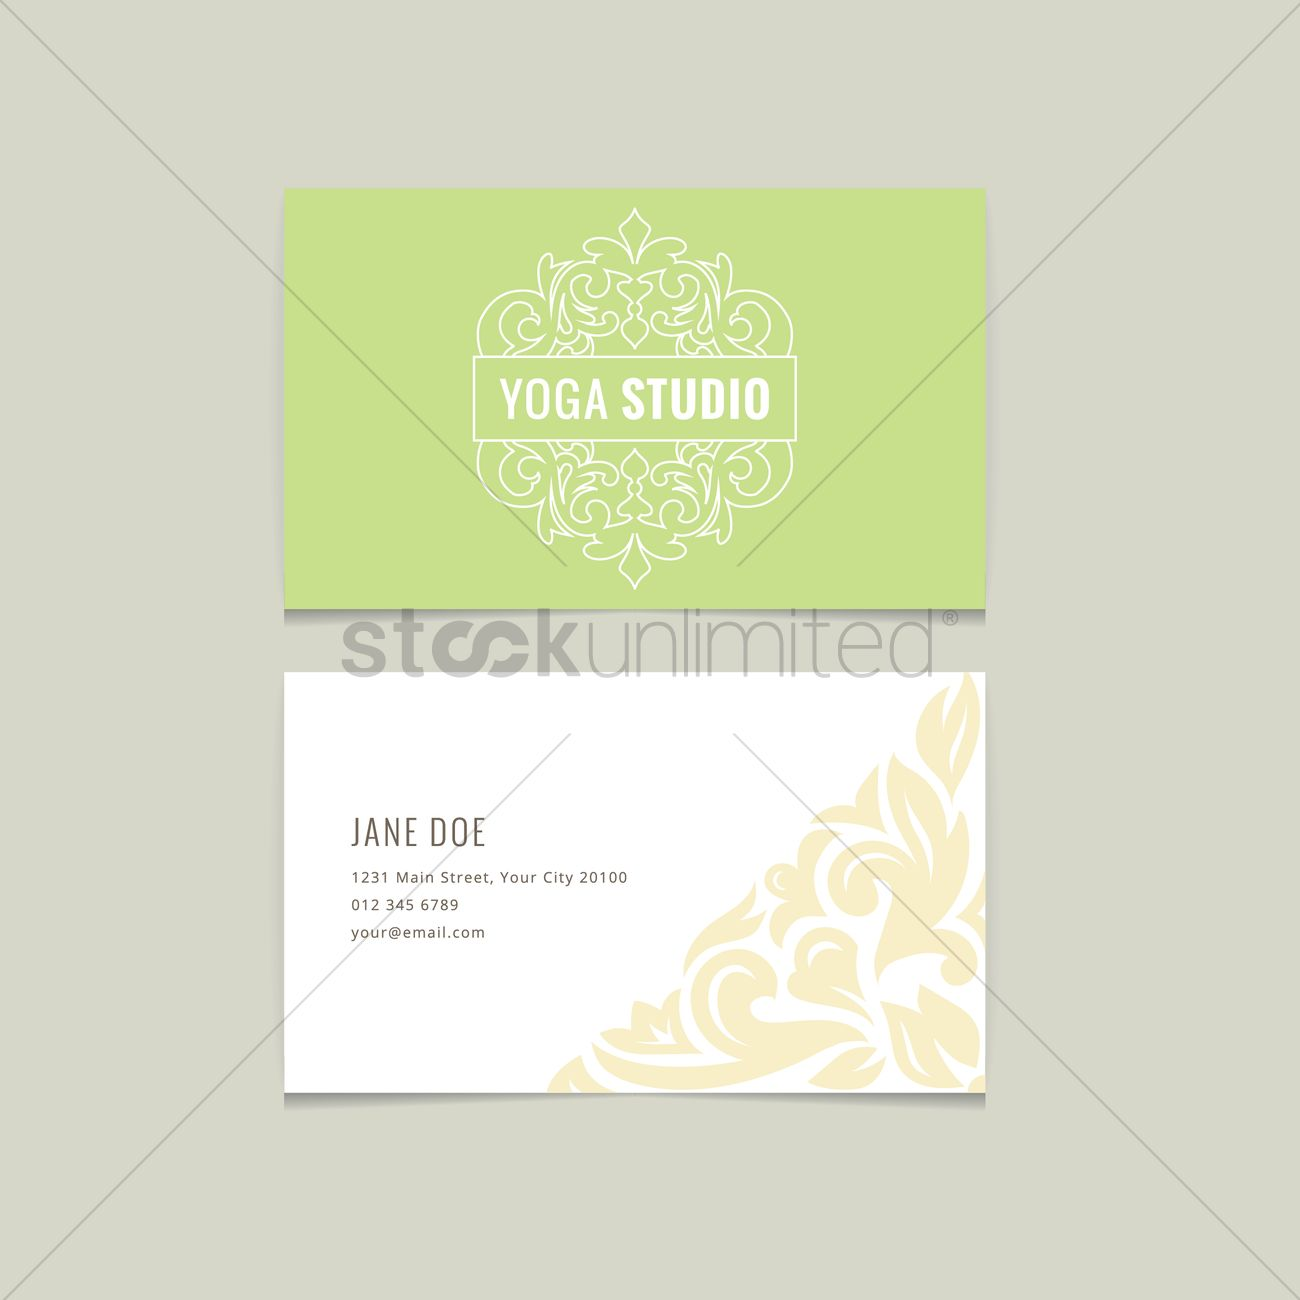 Yoga Studio Name Card Design Vector Graphic